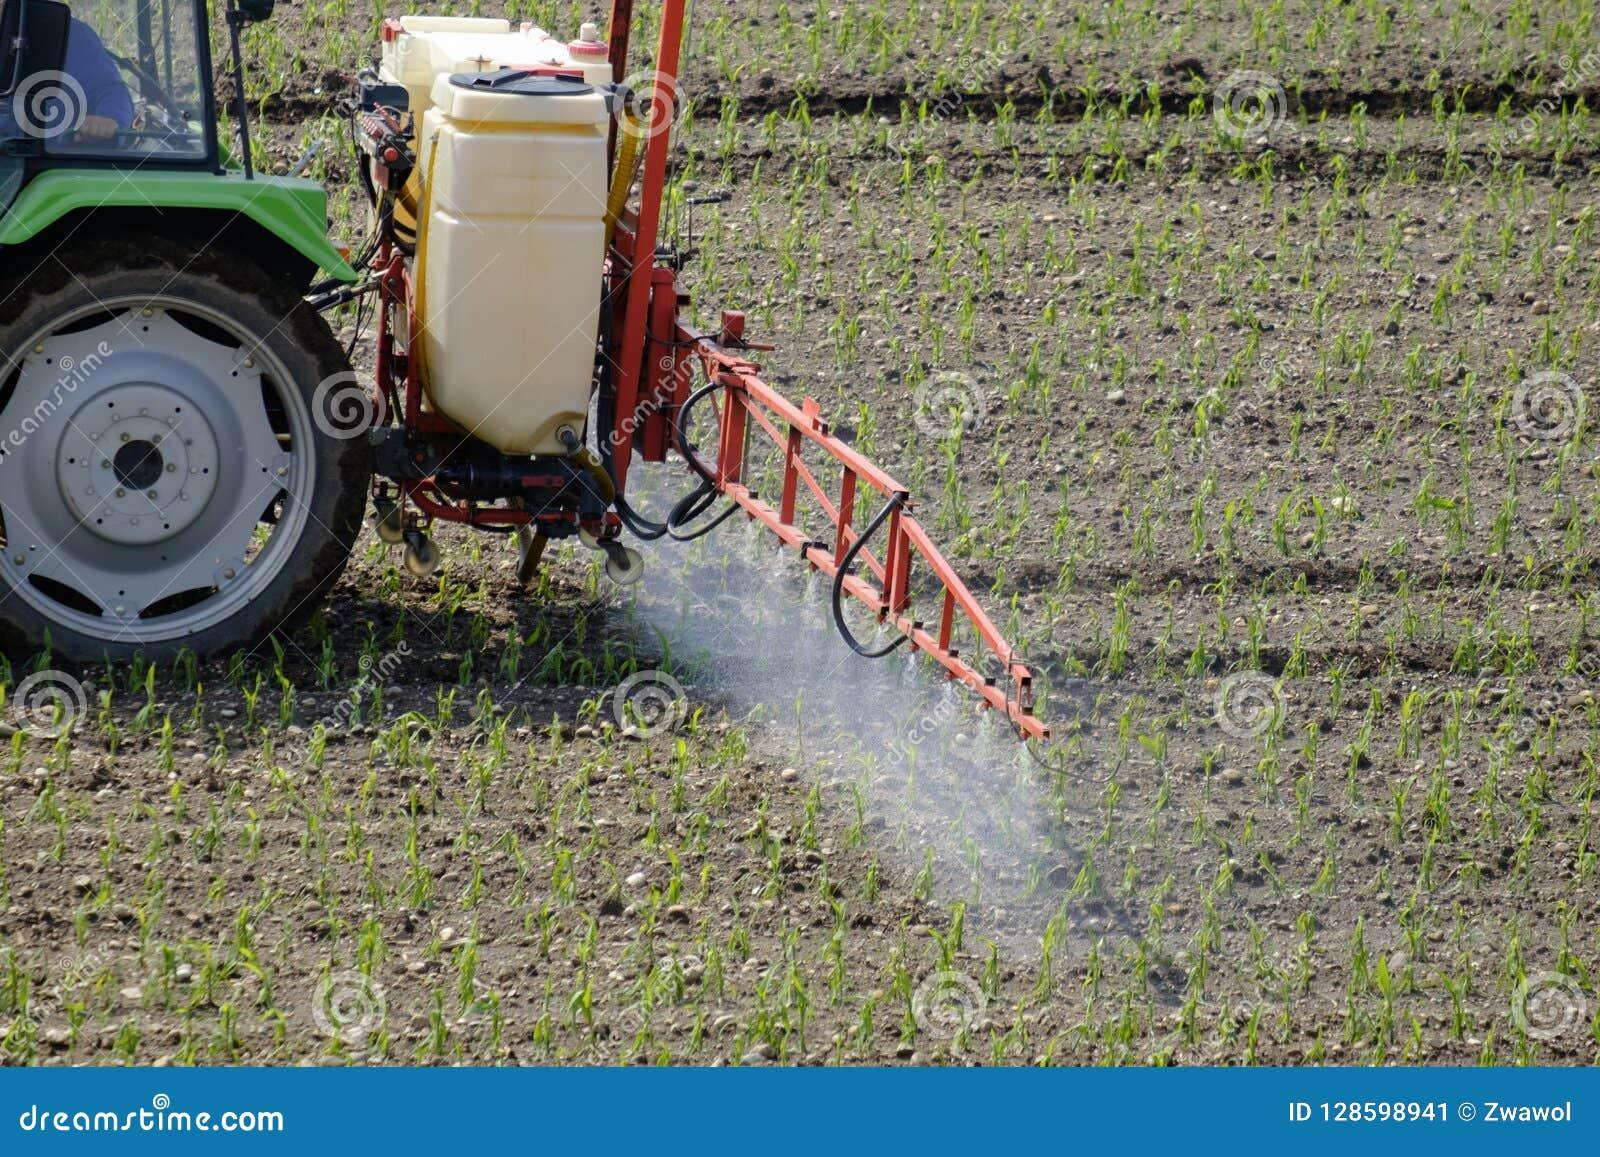 Tractor spraying pesticide